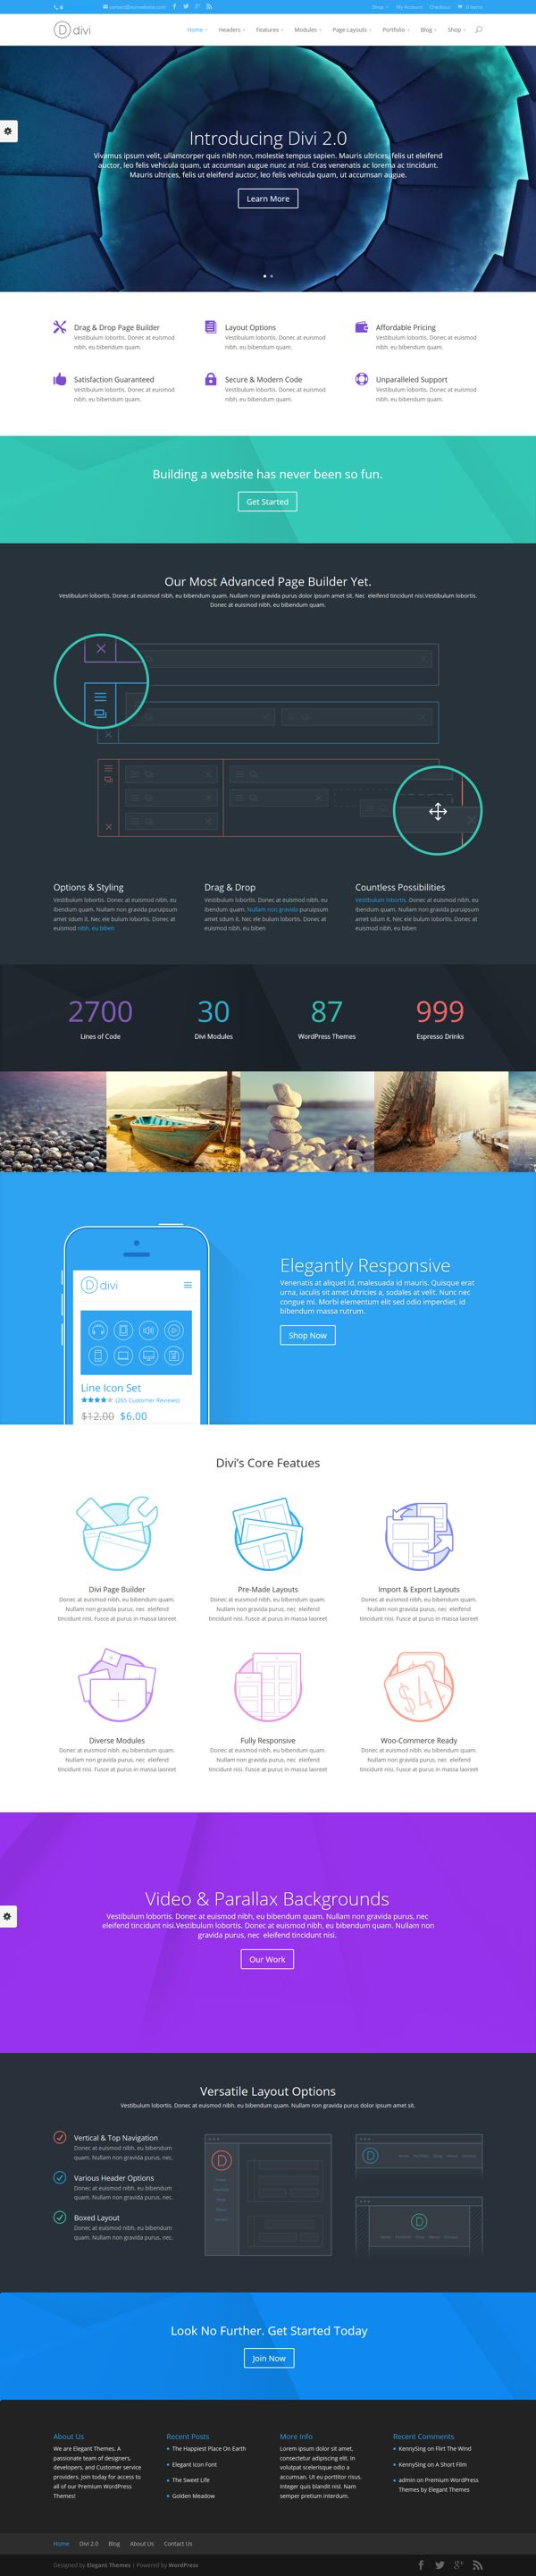 Divi WordPress Theme 2.0 via Behance #web #design